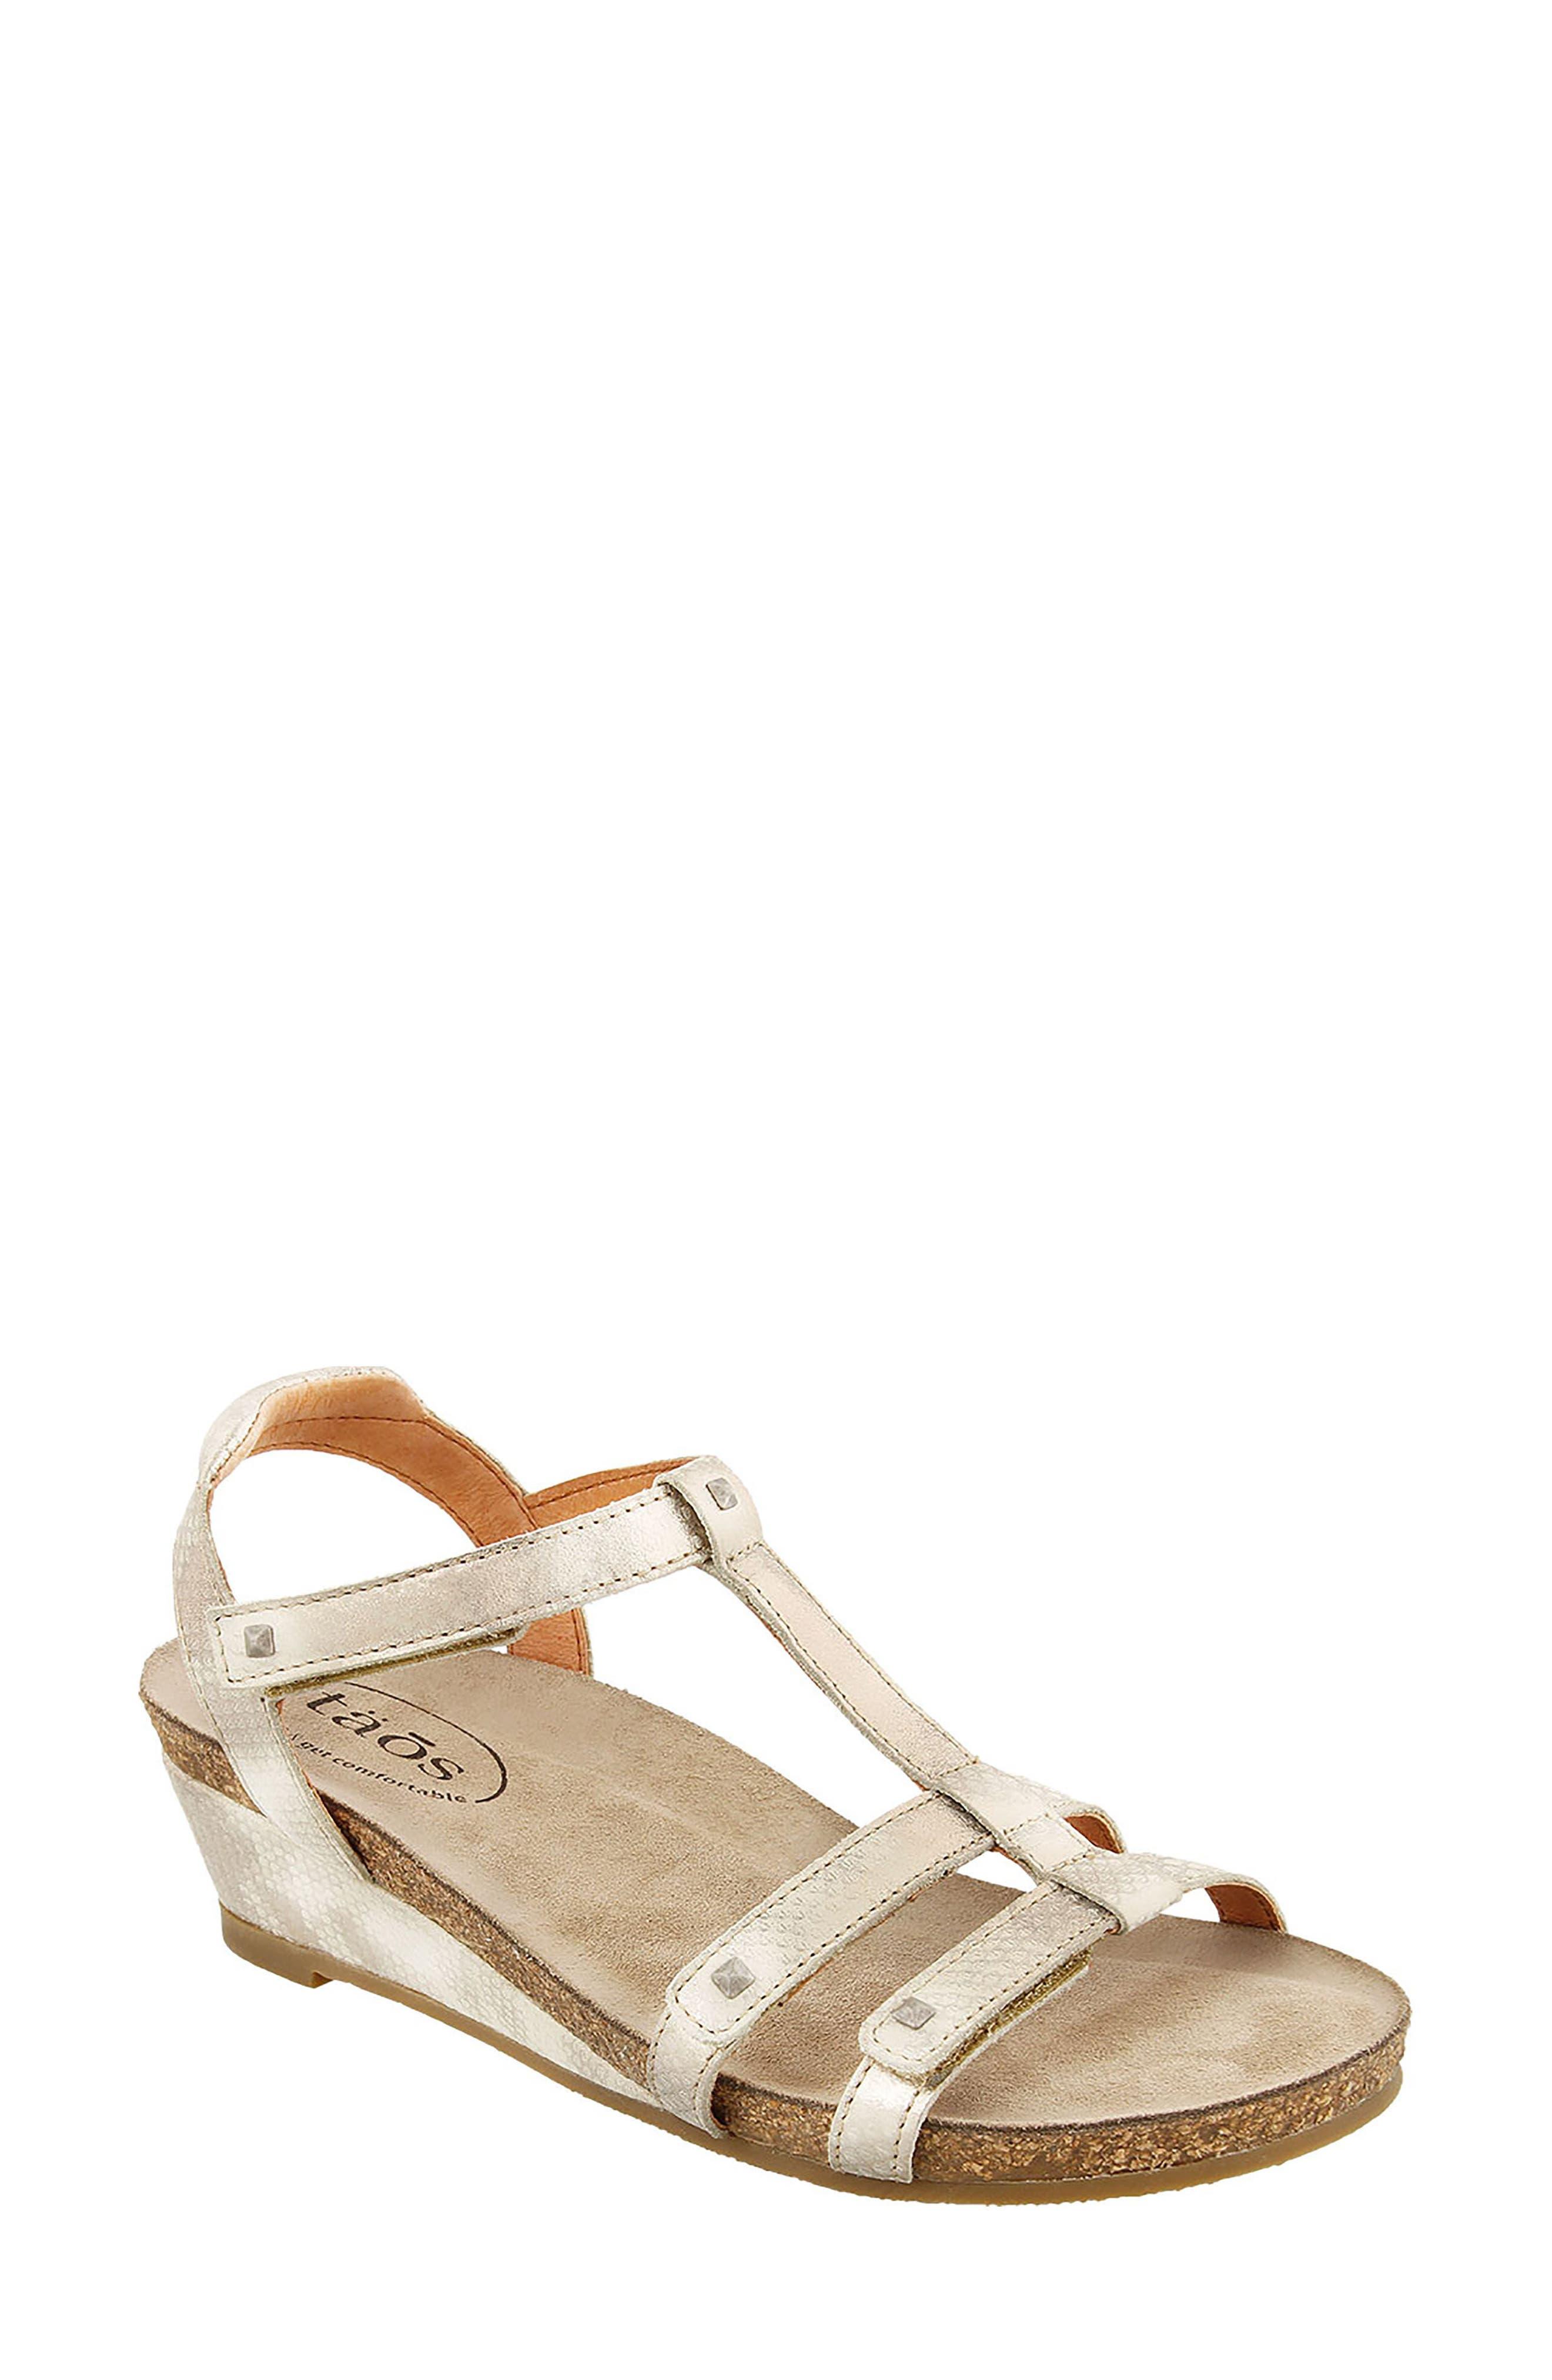 Wanderer Sandal,                             Main thumbnail 1, color,                             Silver Leather